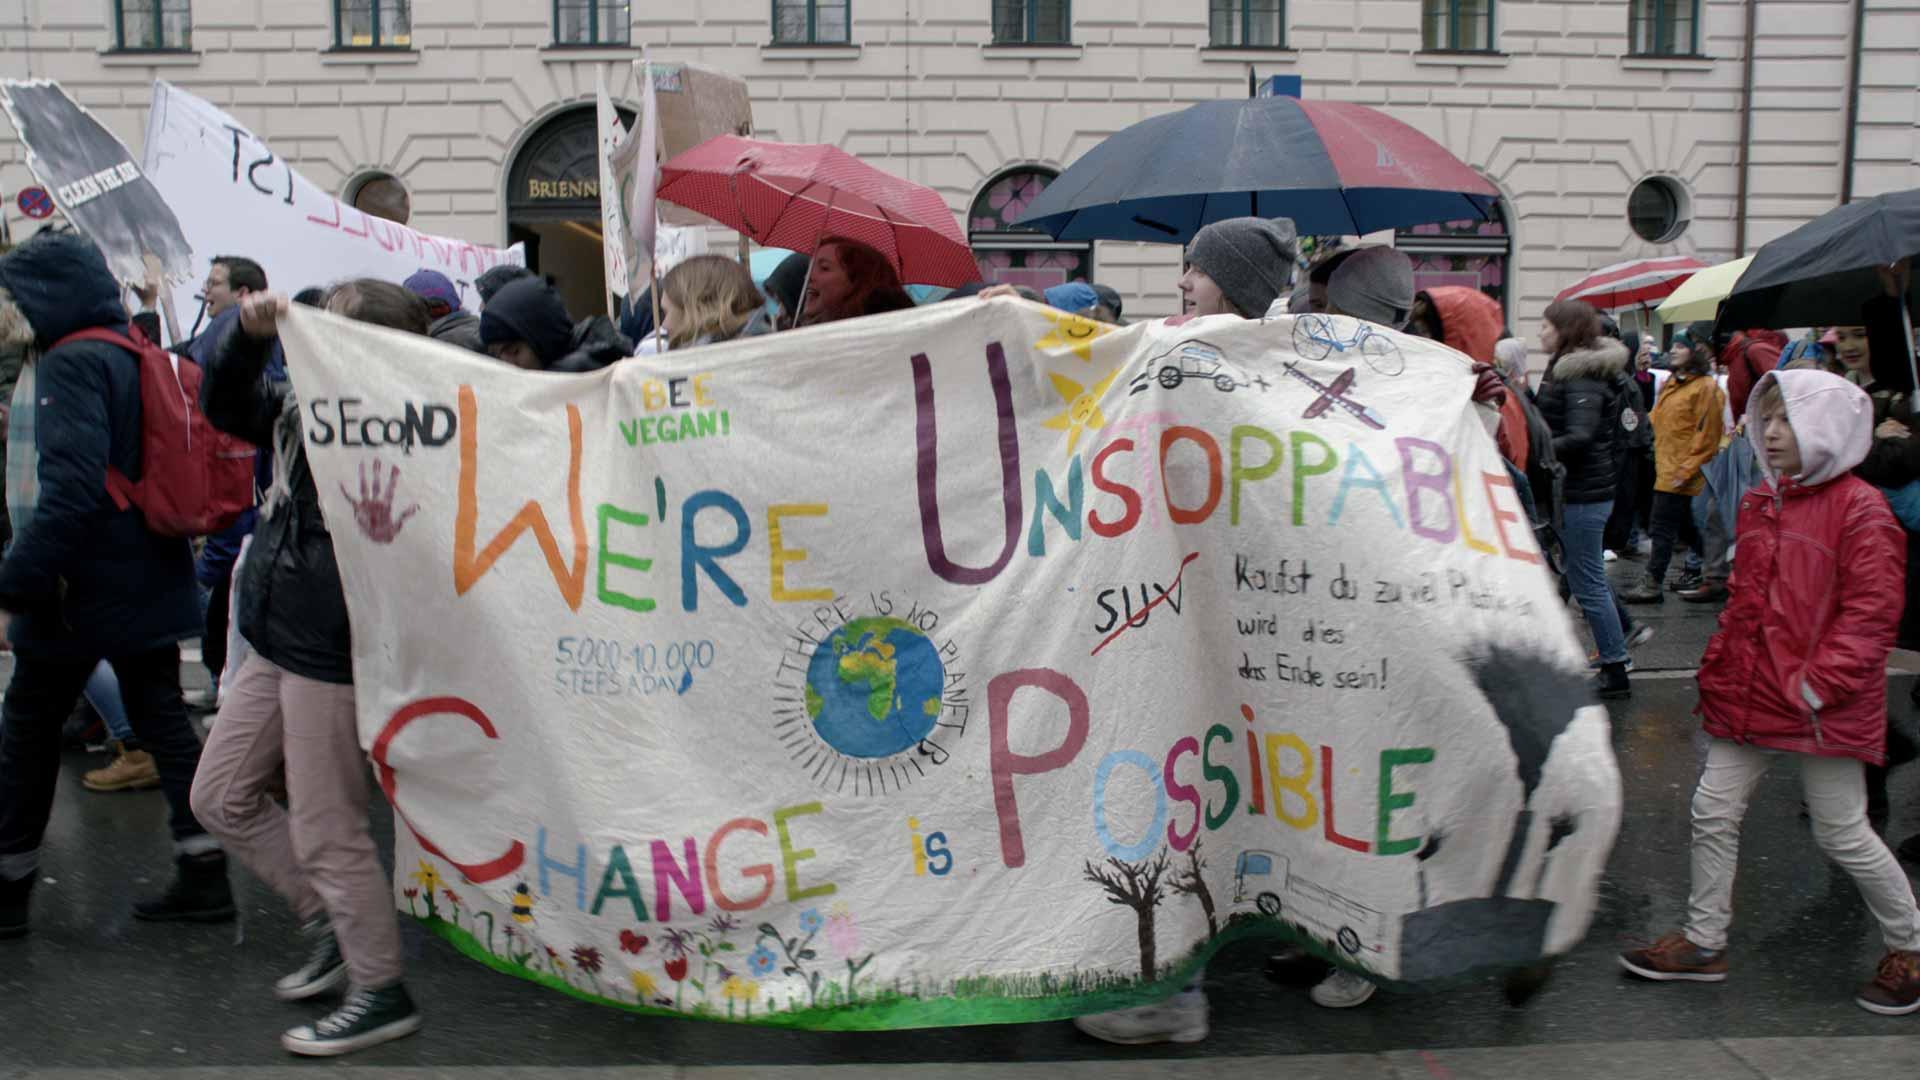 we are unstoppable - change is possible - junge Aktivisten tragen ein Transparent